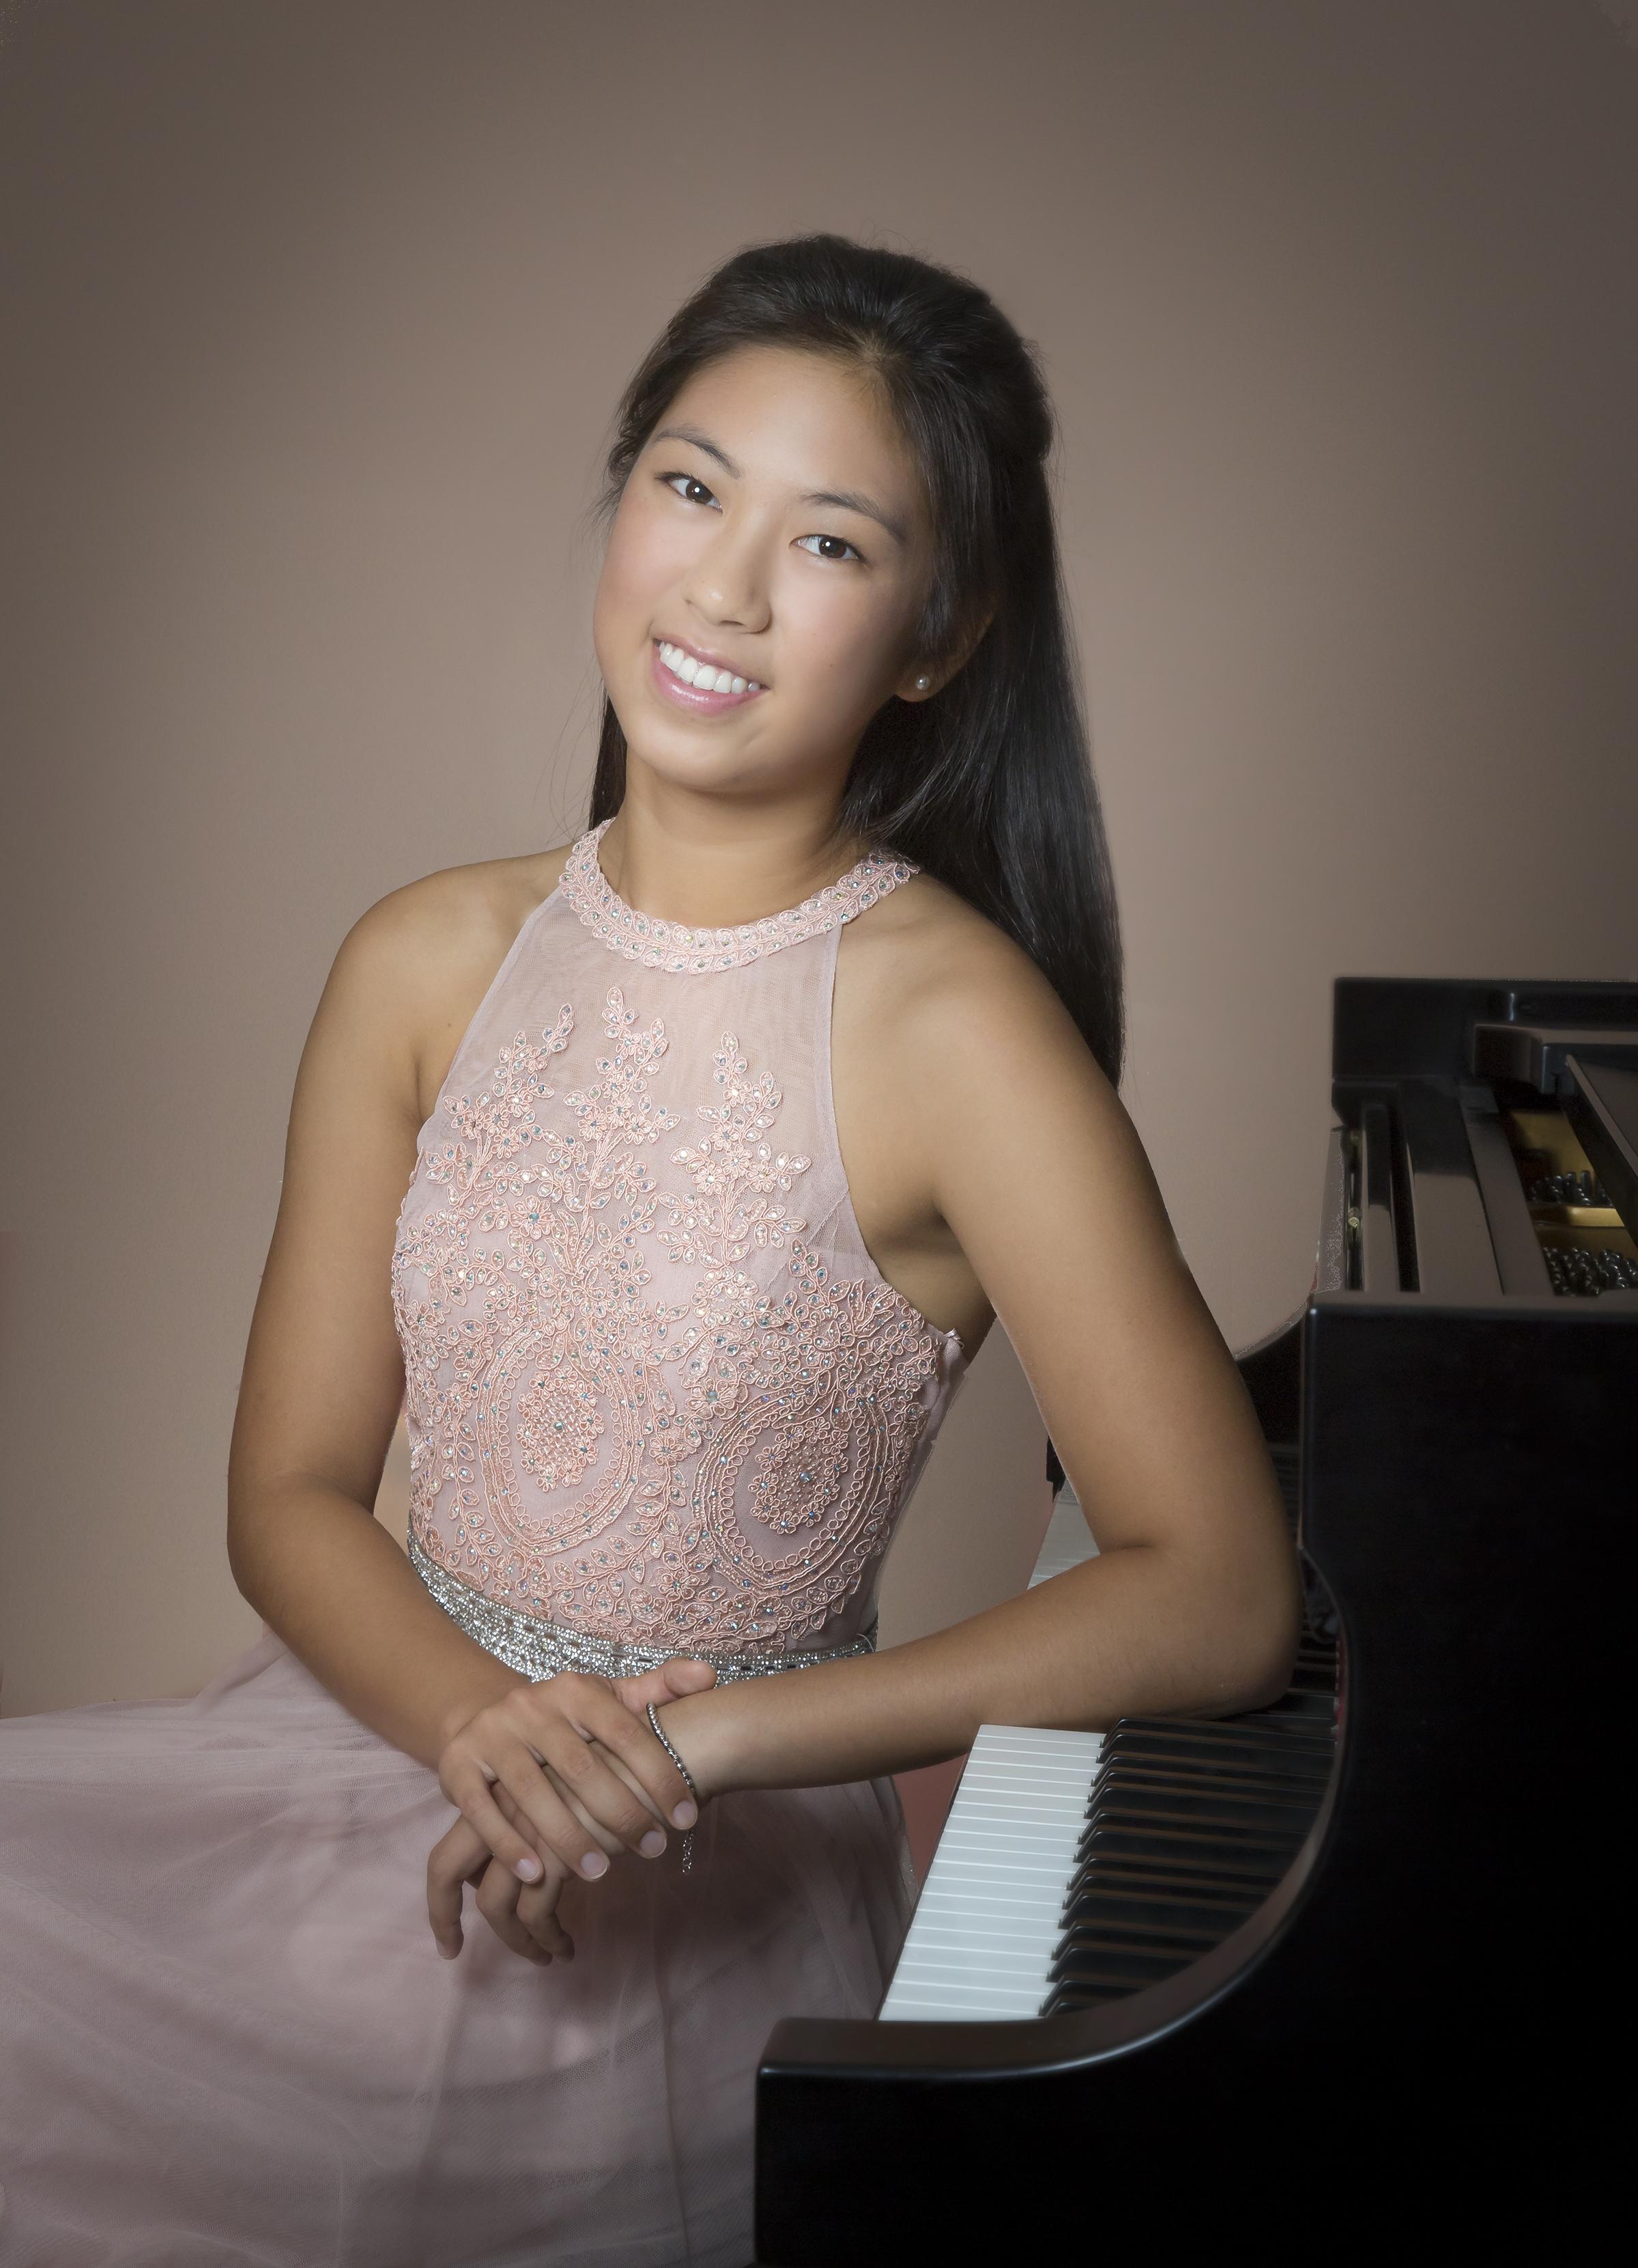 Symphony                        Jacqueline Chen (piano) Schumann    Piano Concerto in A Minor, Op. 54 (movement 1)